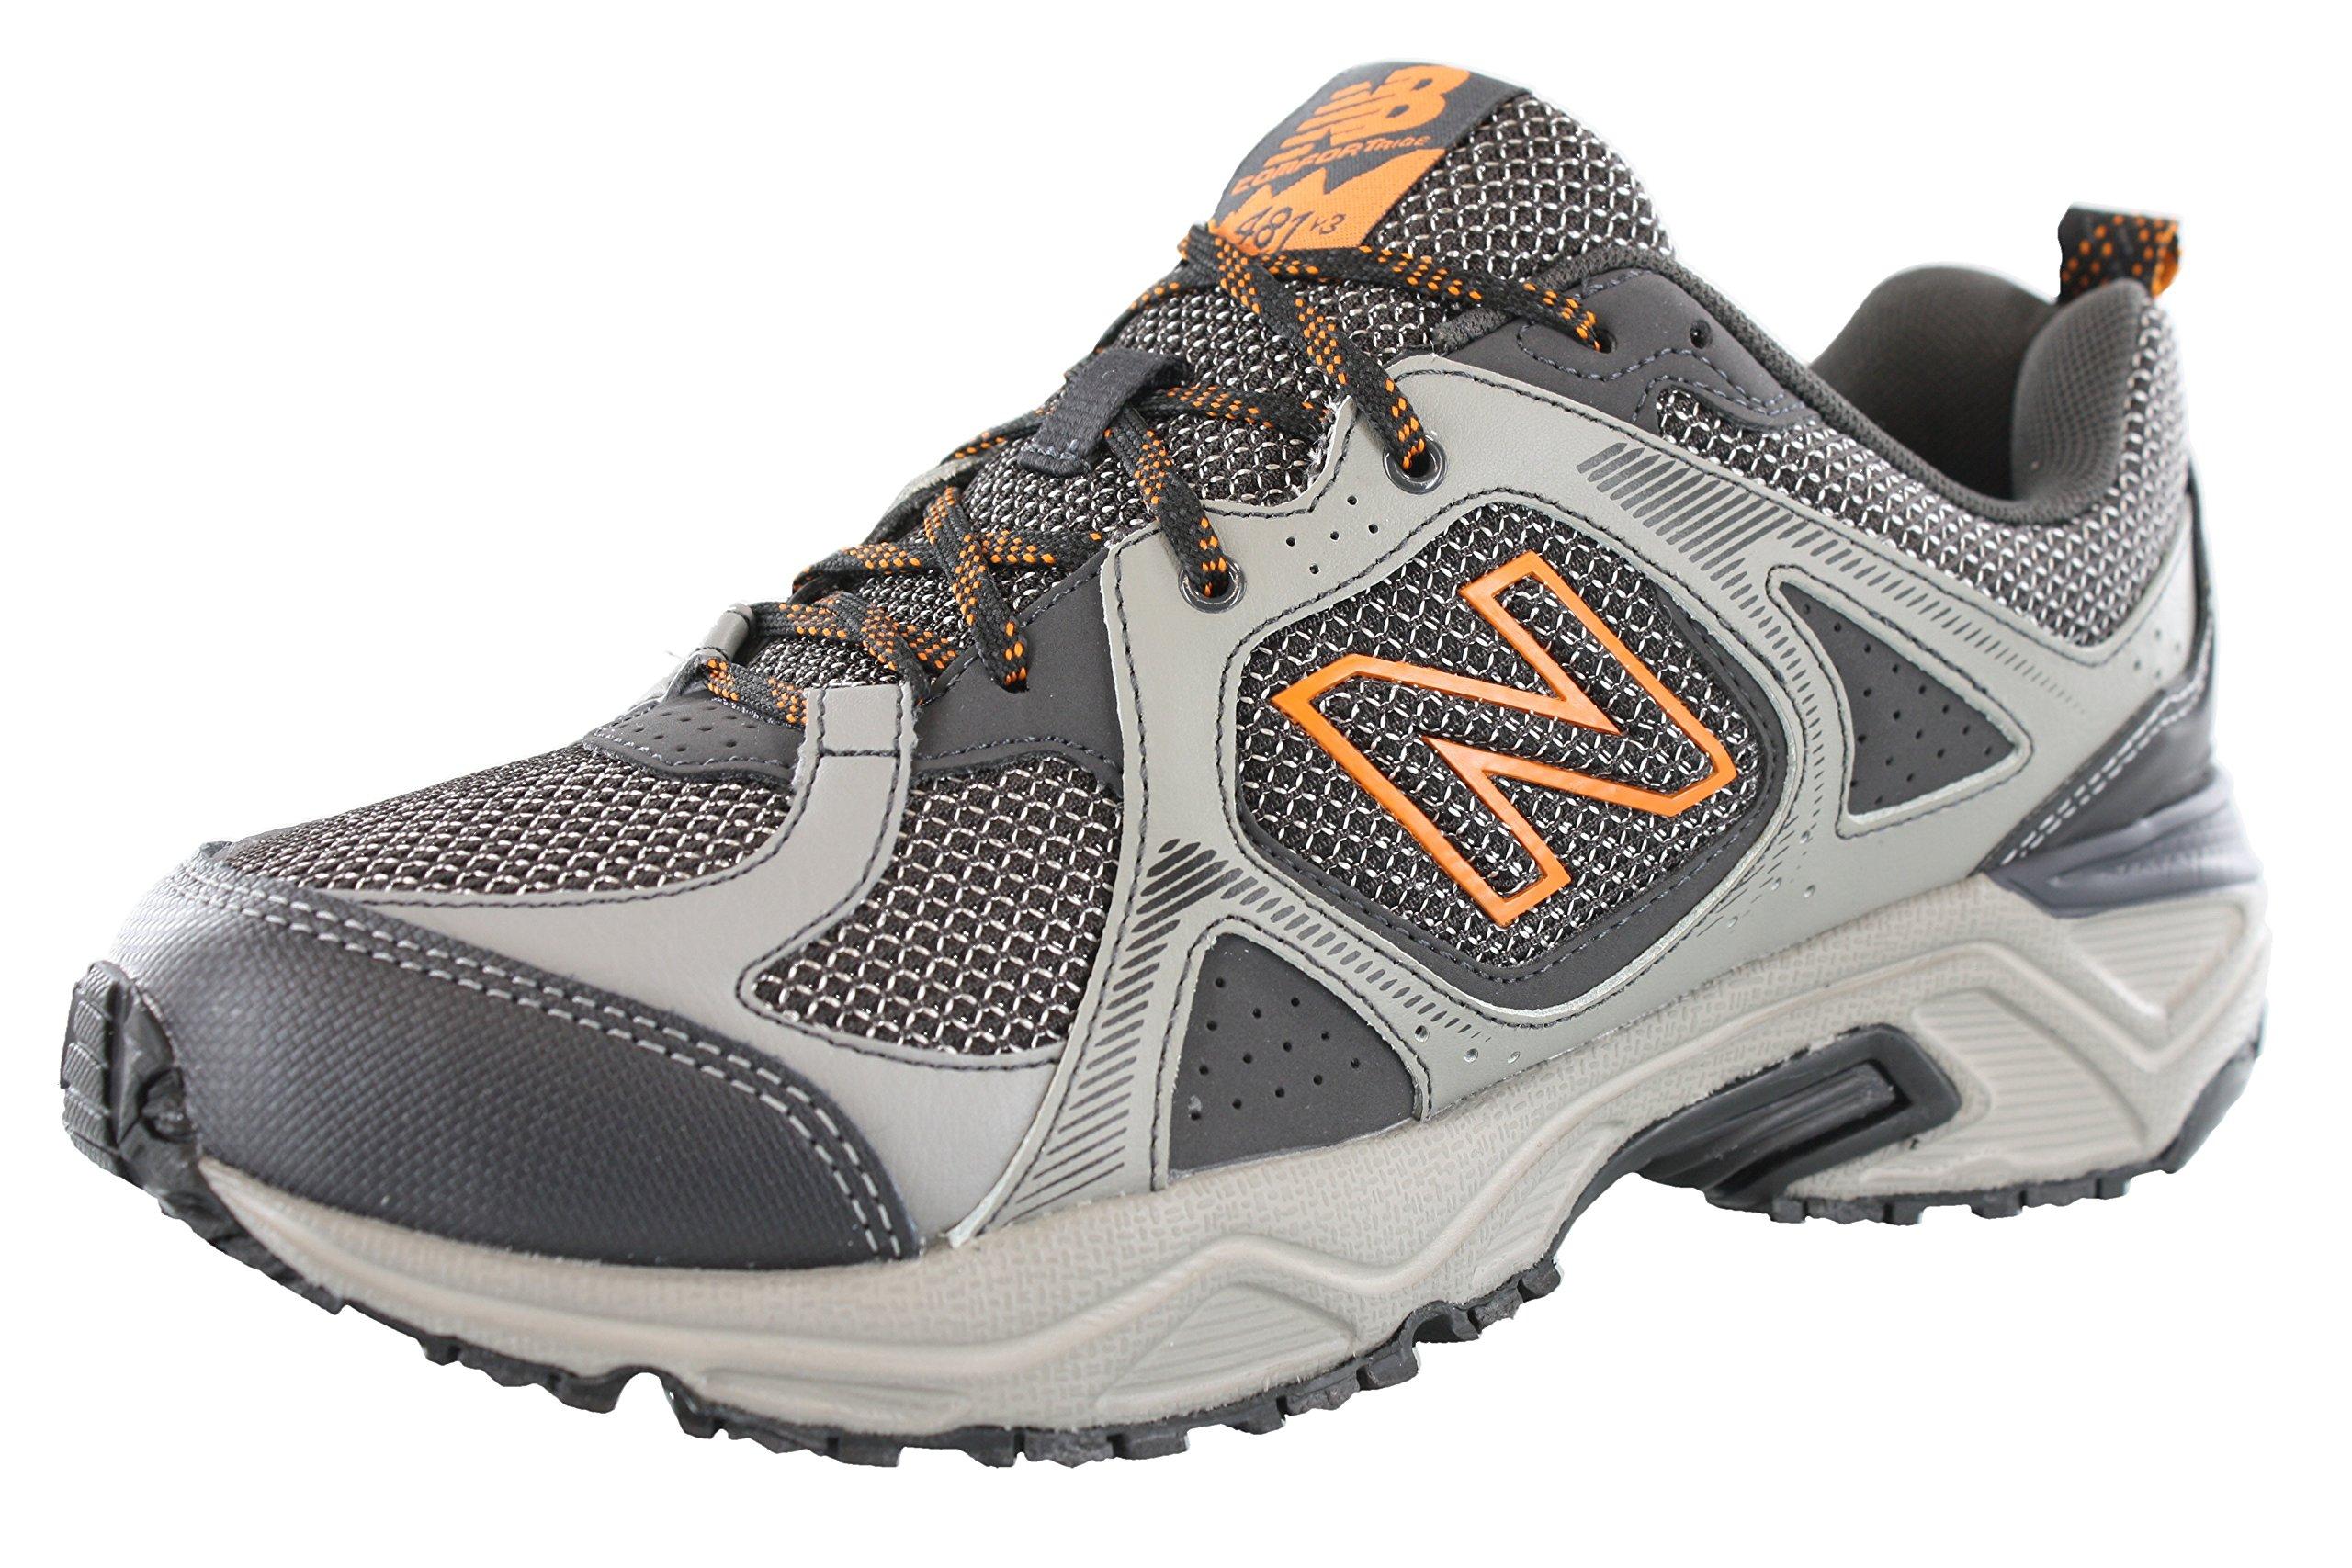 New Balance Men's 481V3 Cushioning Trail Running Shoe, Grey, 13 4E US by New Balance